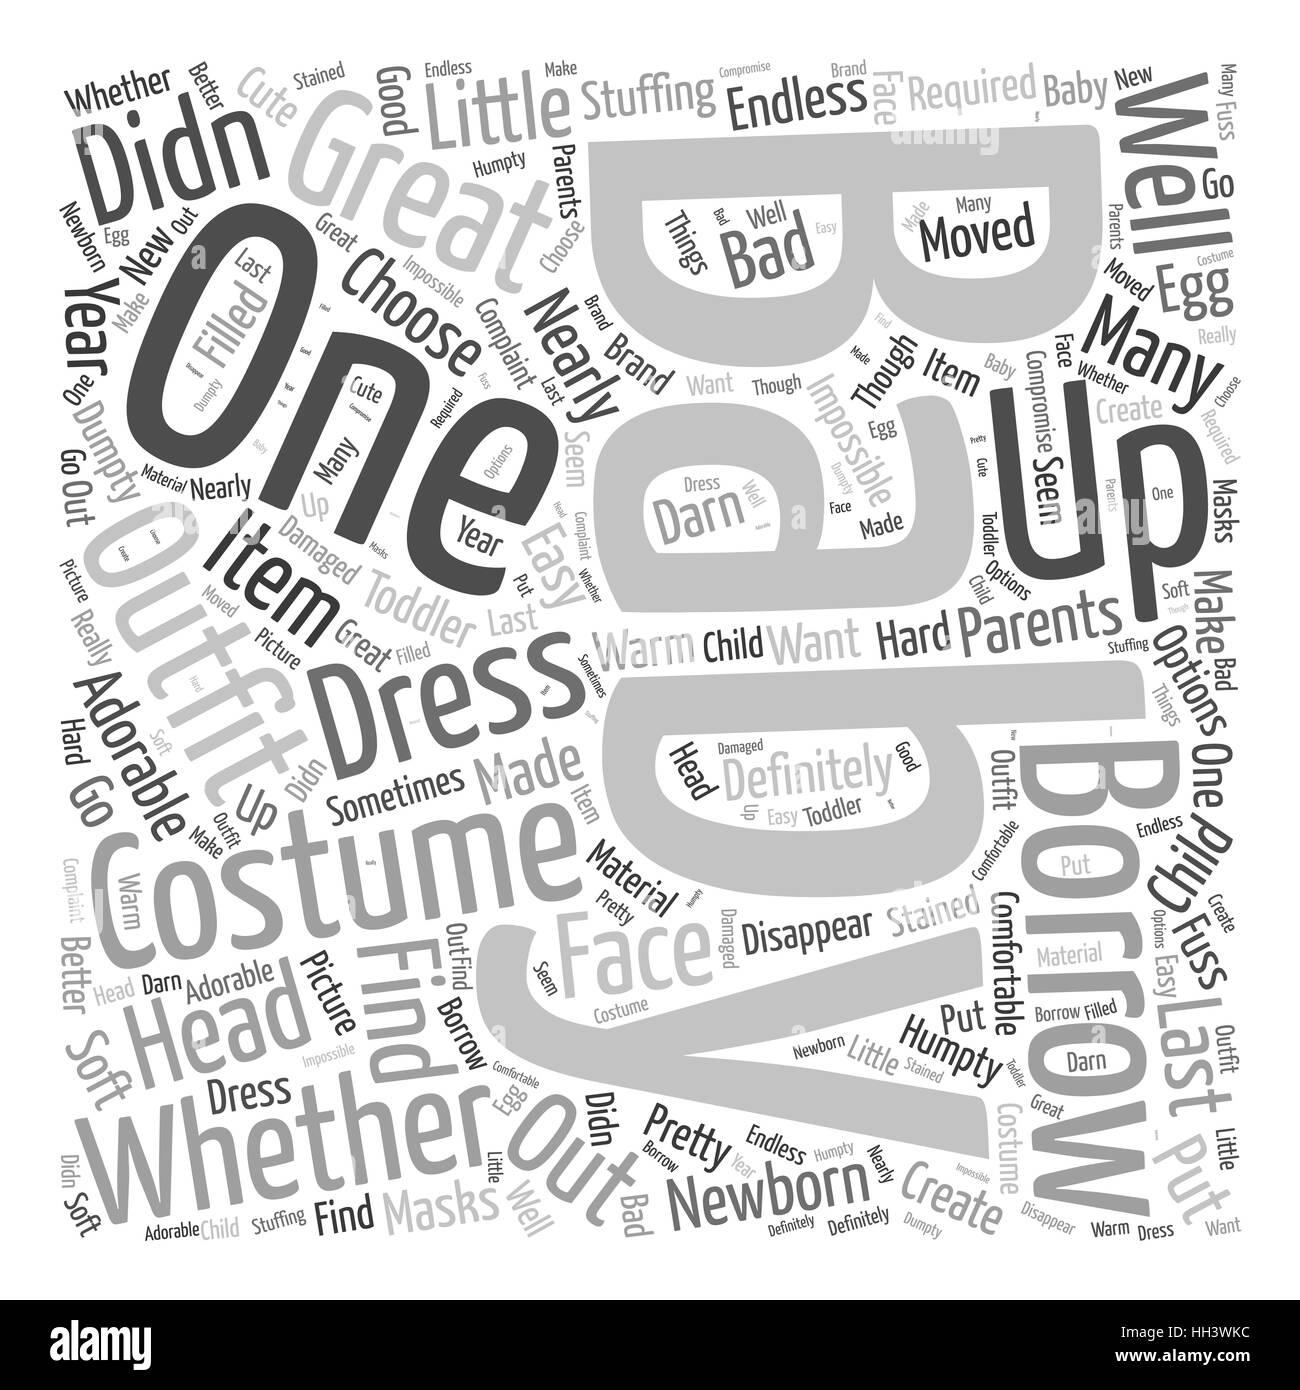 costumes for babies Word Cloud Concept Stock Vector Art